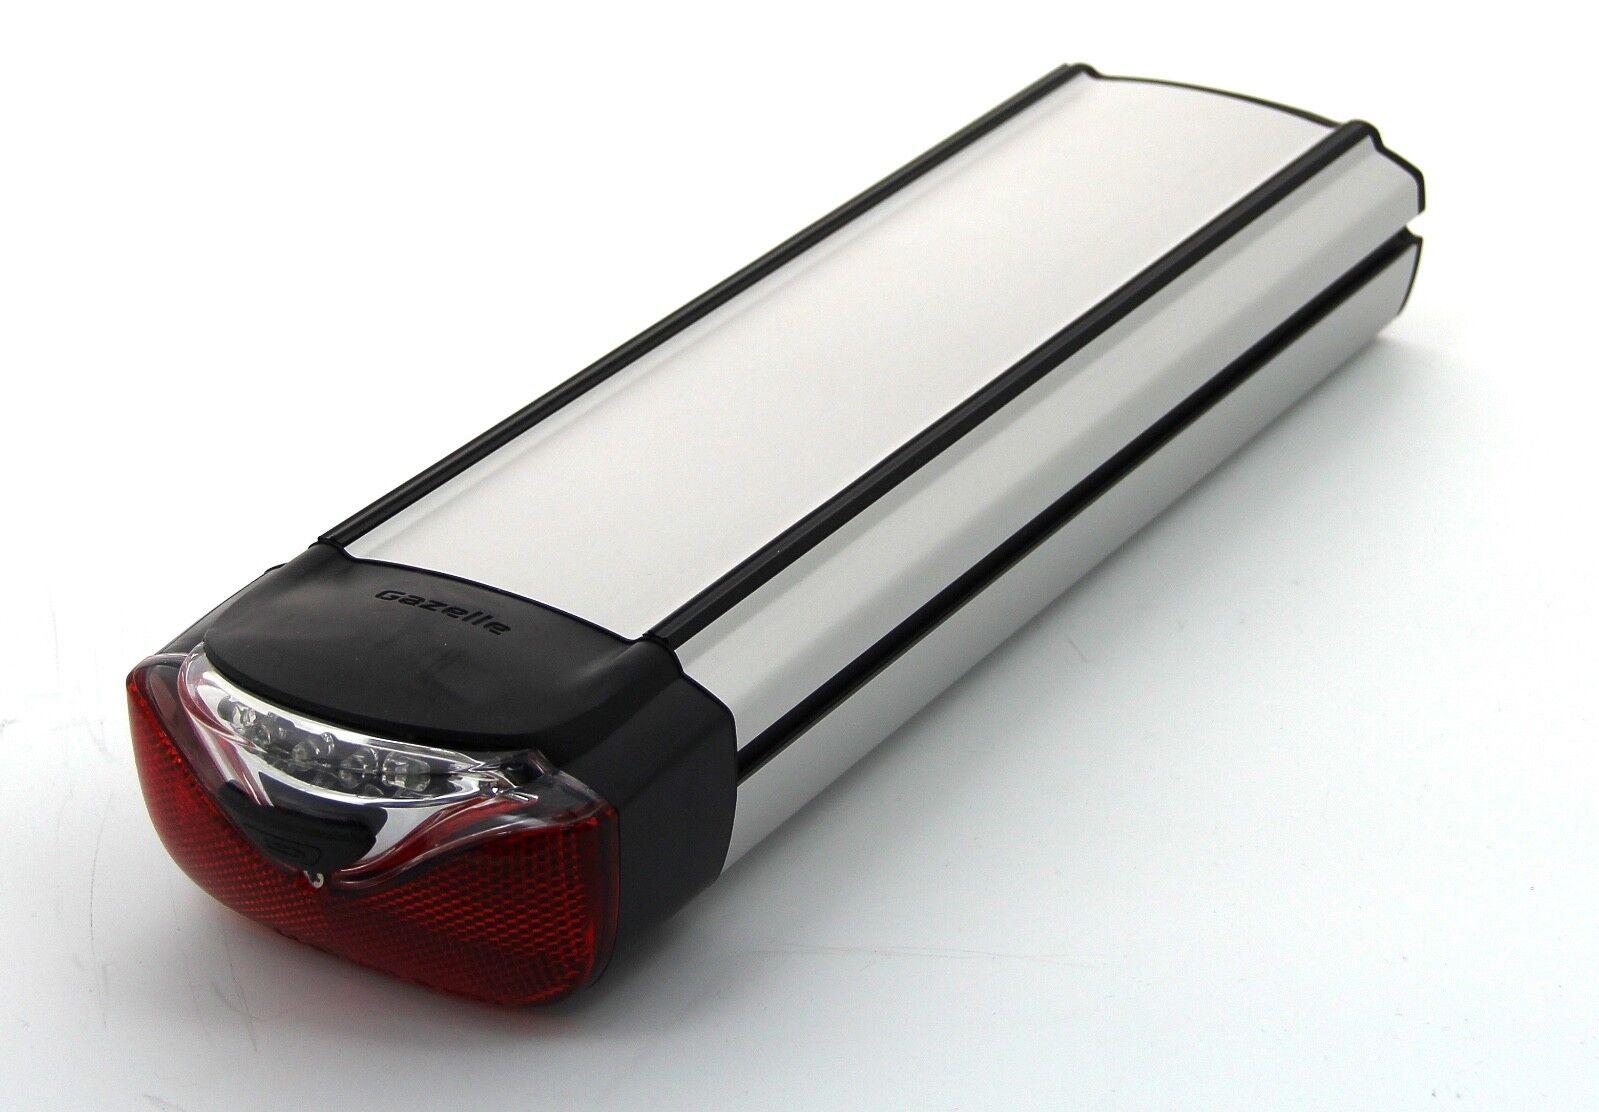 E-bike repuesto-bateria gacela innergy 10s5p icr18650-22p   36v   10,75ah   387wh